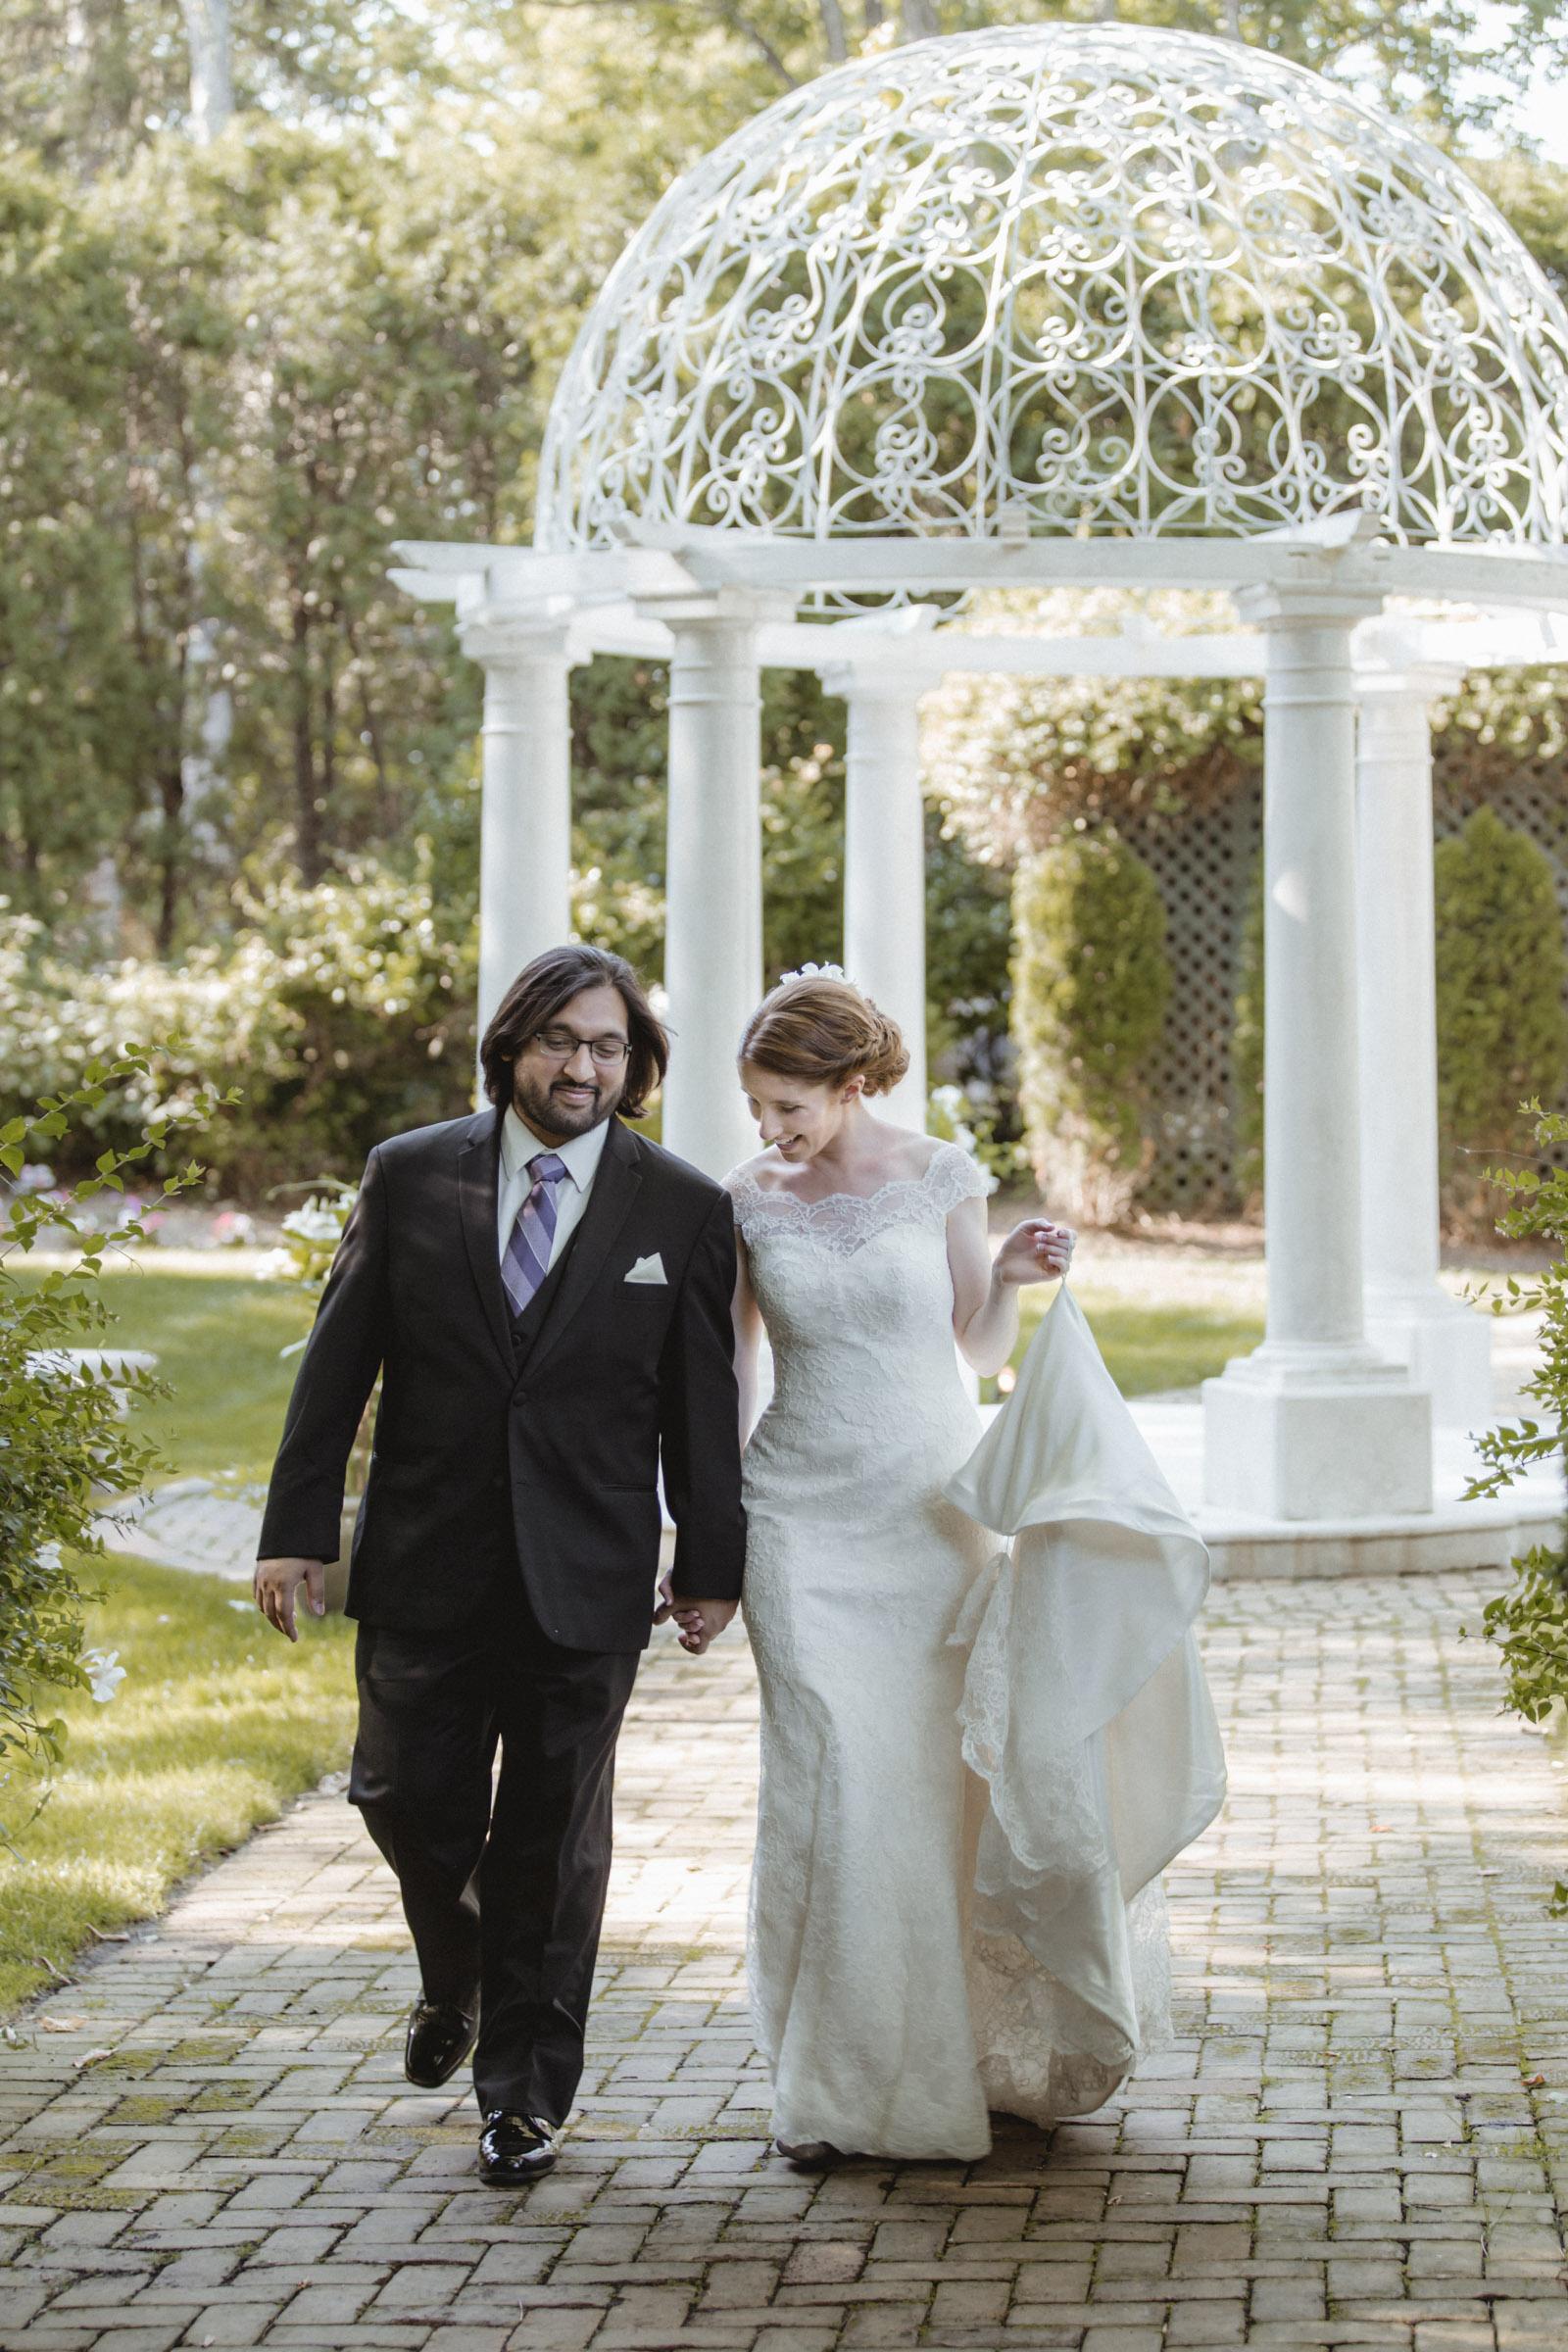 Bride and groom walk through garden - Estate at Florentine Gardens wedding - Hudson Valley Wedding - Kelsey & Anish's wedding - Amy Sims Photography